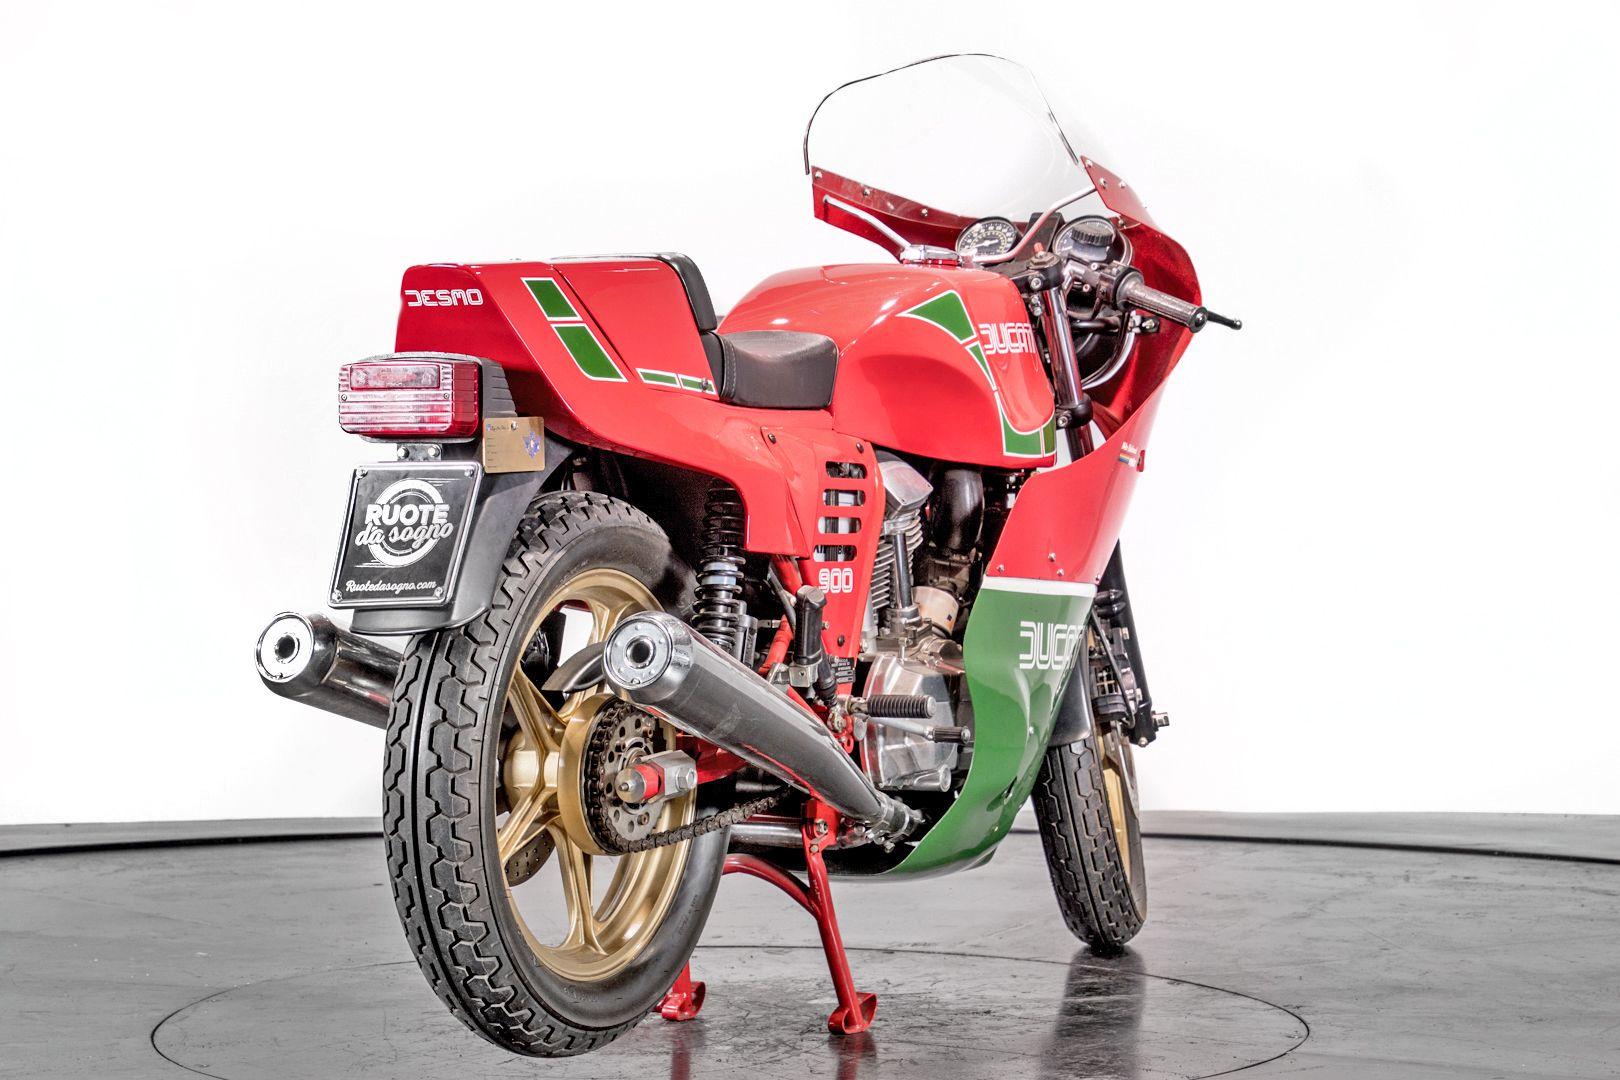 1984 Ducati 900 Mike Hailwood Replica 81550